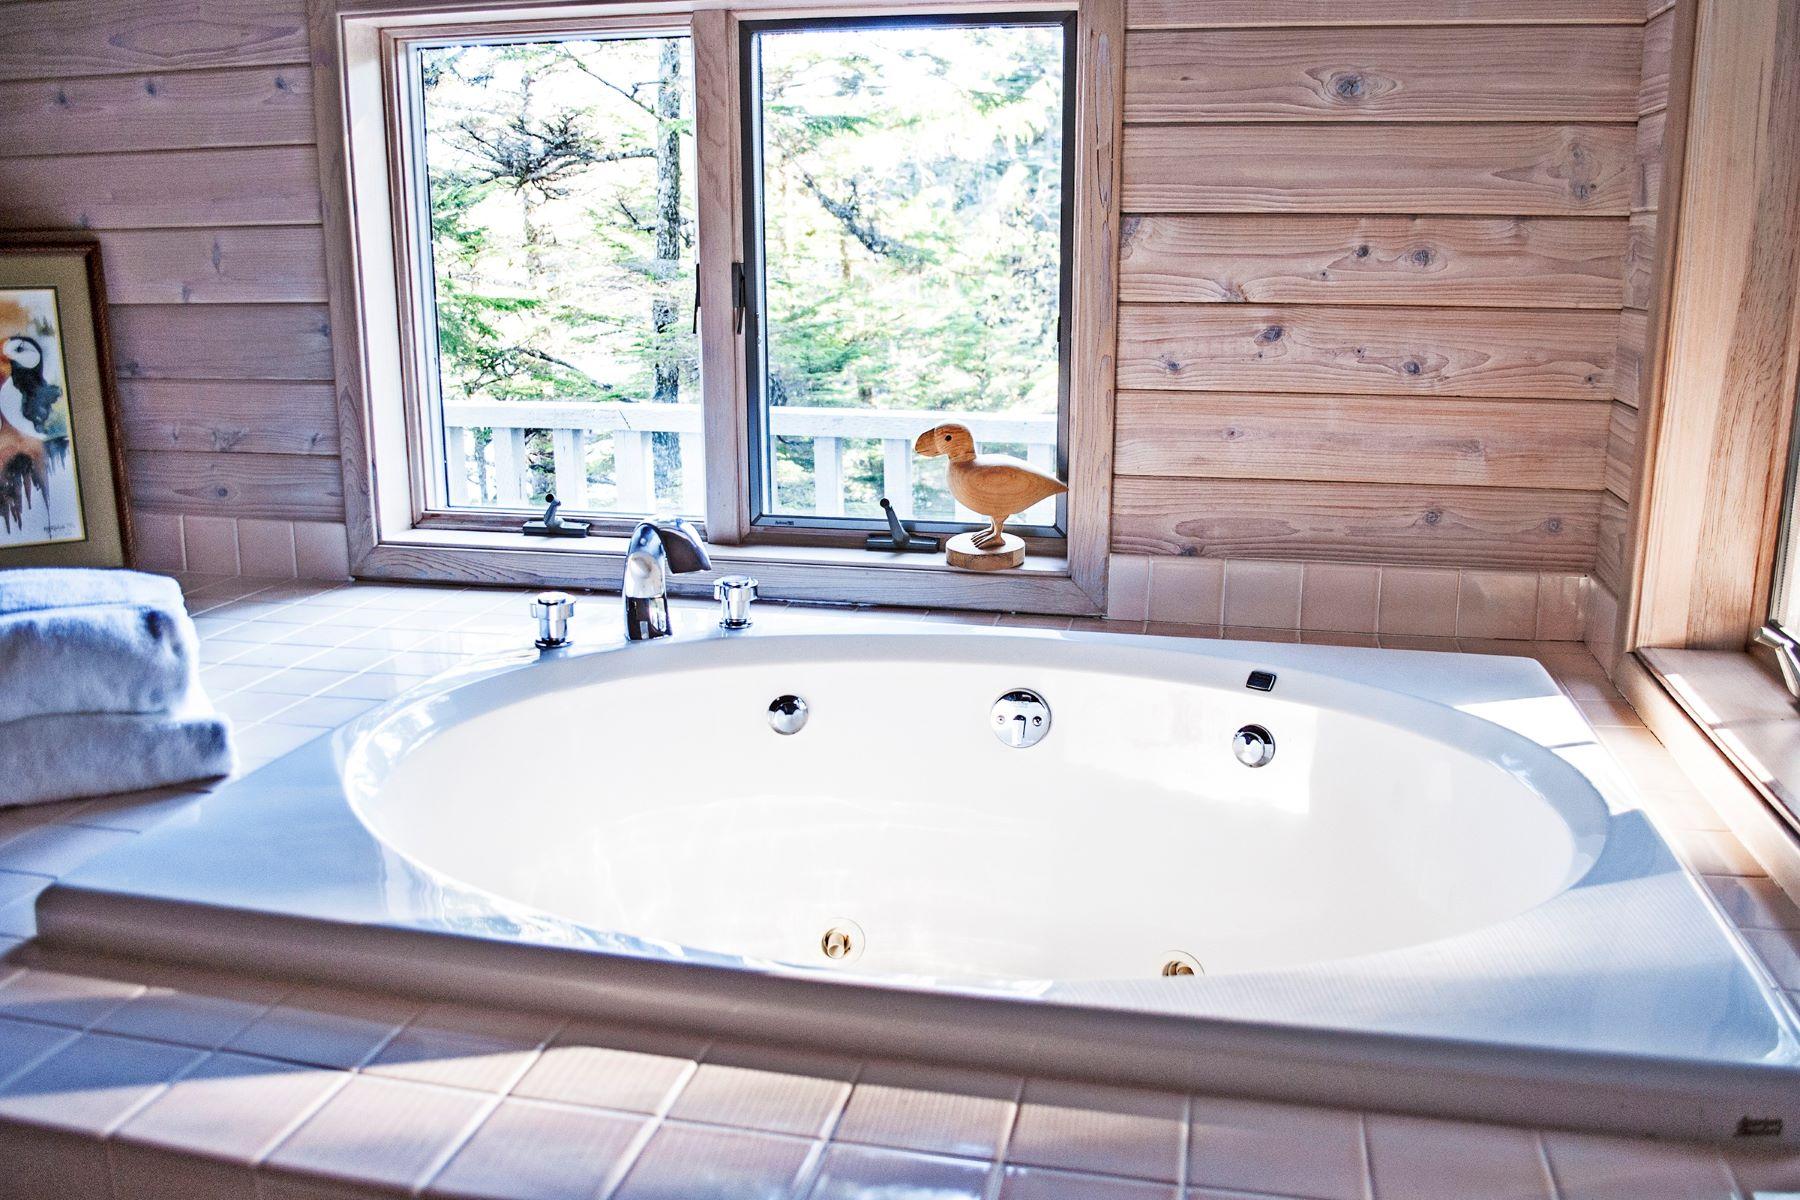 Additional photo for property listing at Big Gull Island Lot 153 Big Gull Island Sitka, Alaska 99835 United States